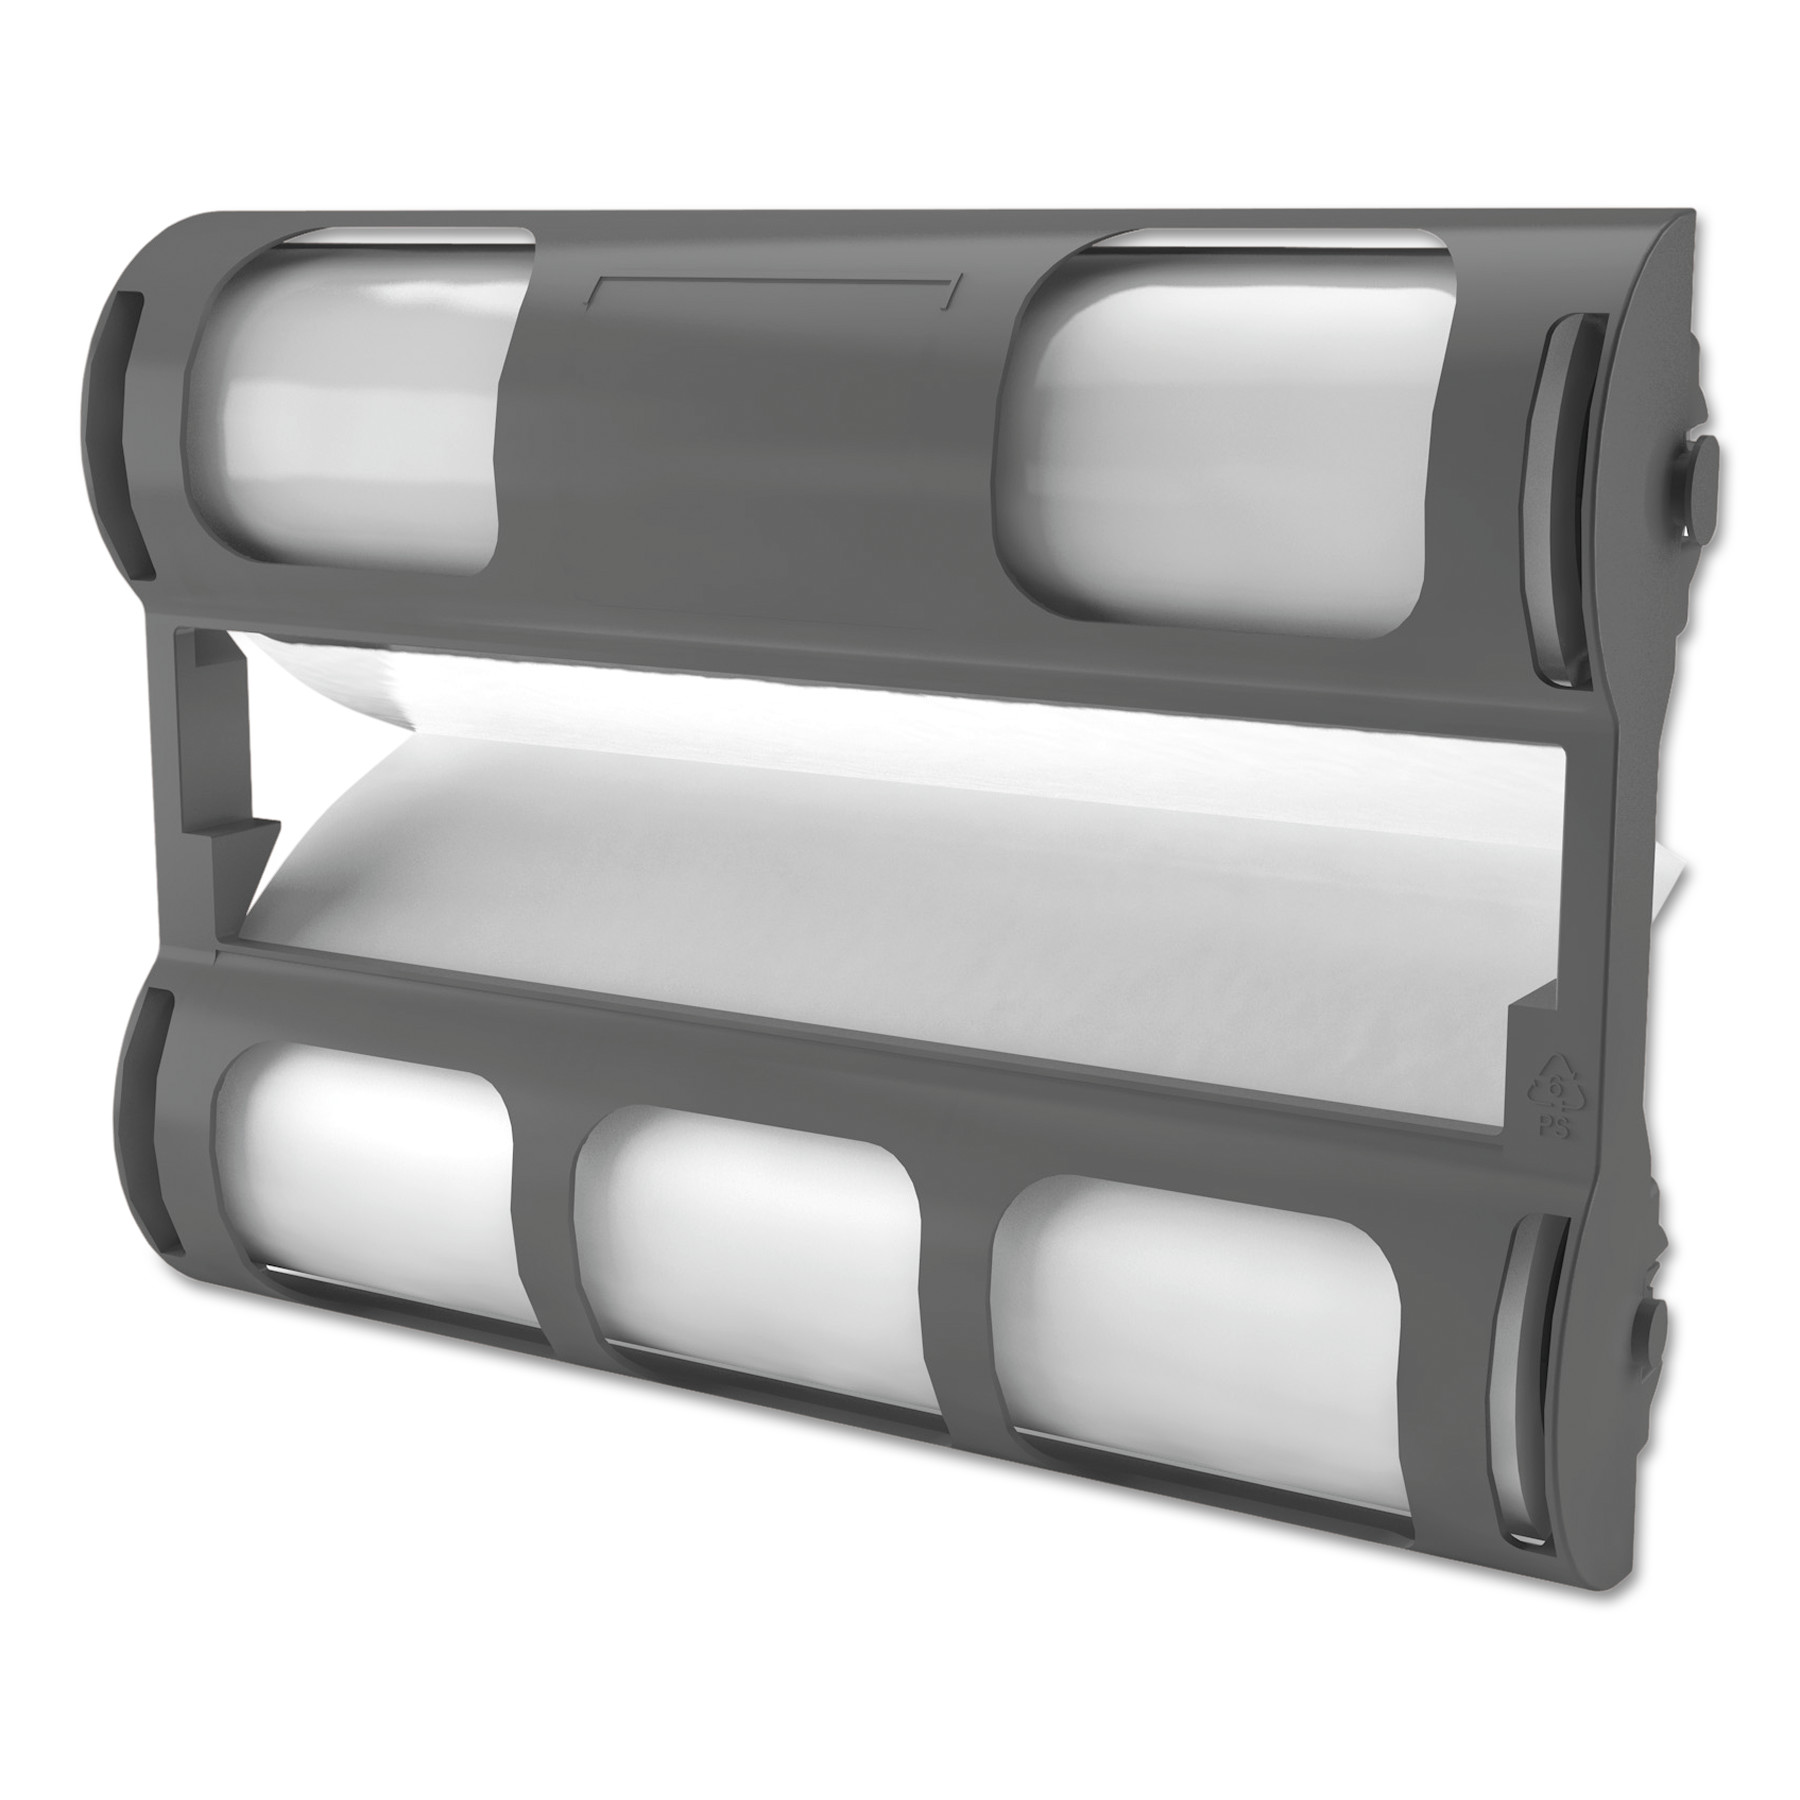 "Xyron Permanent High-Tack Adhesive Refill Roll for XM1255 Laminator, 12"" x 100 ft. -XRNAT1251100"